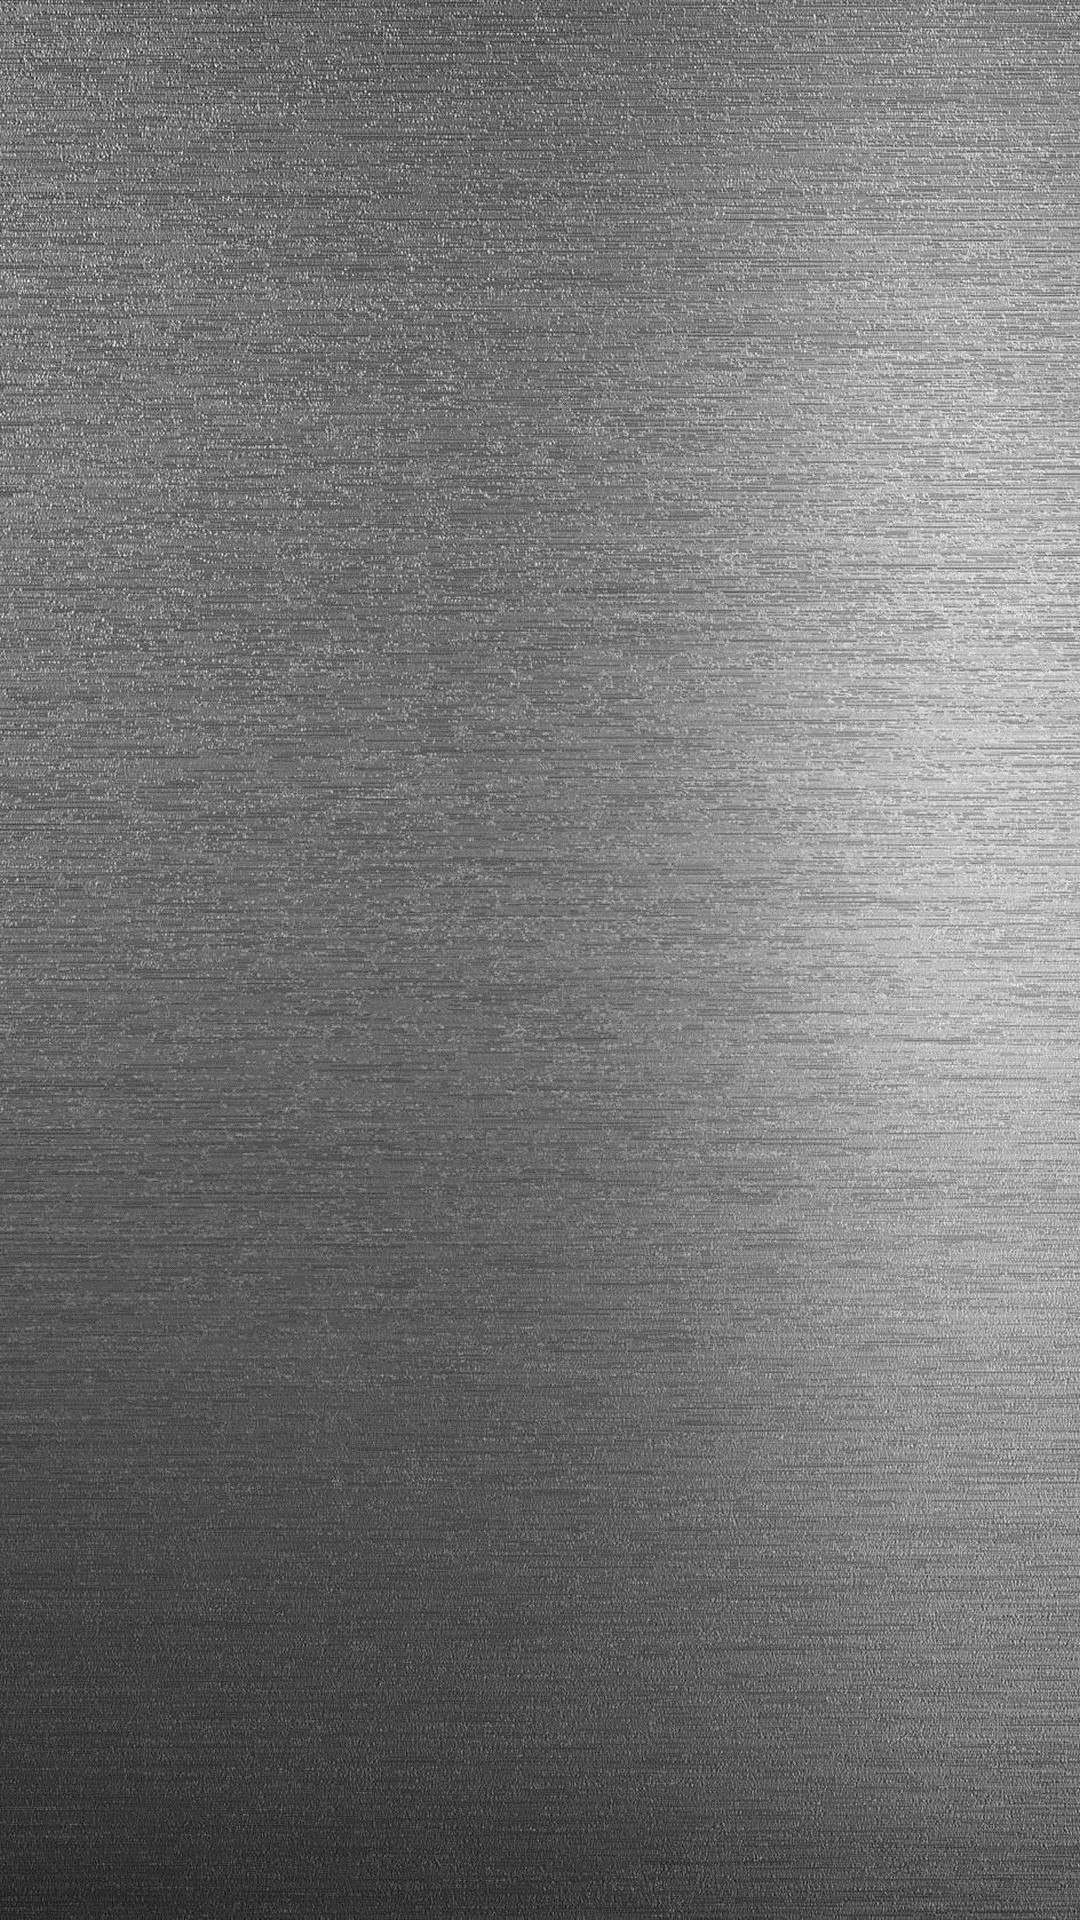 Gray iphone 6 wallpaper